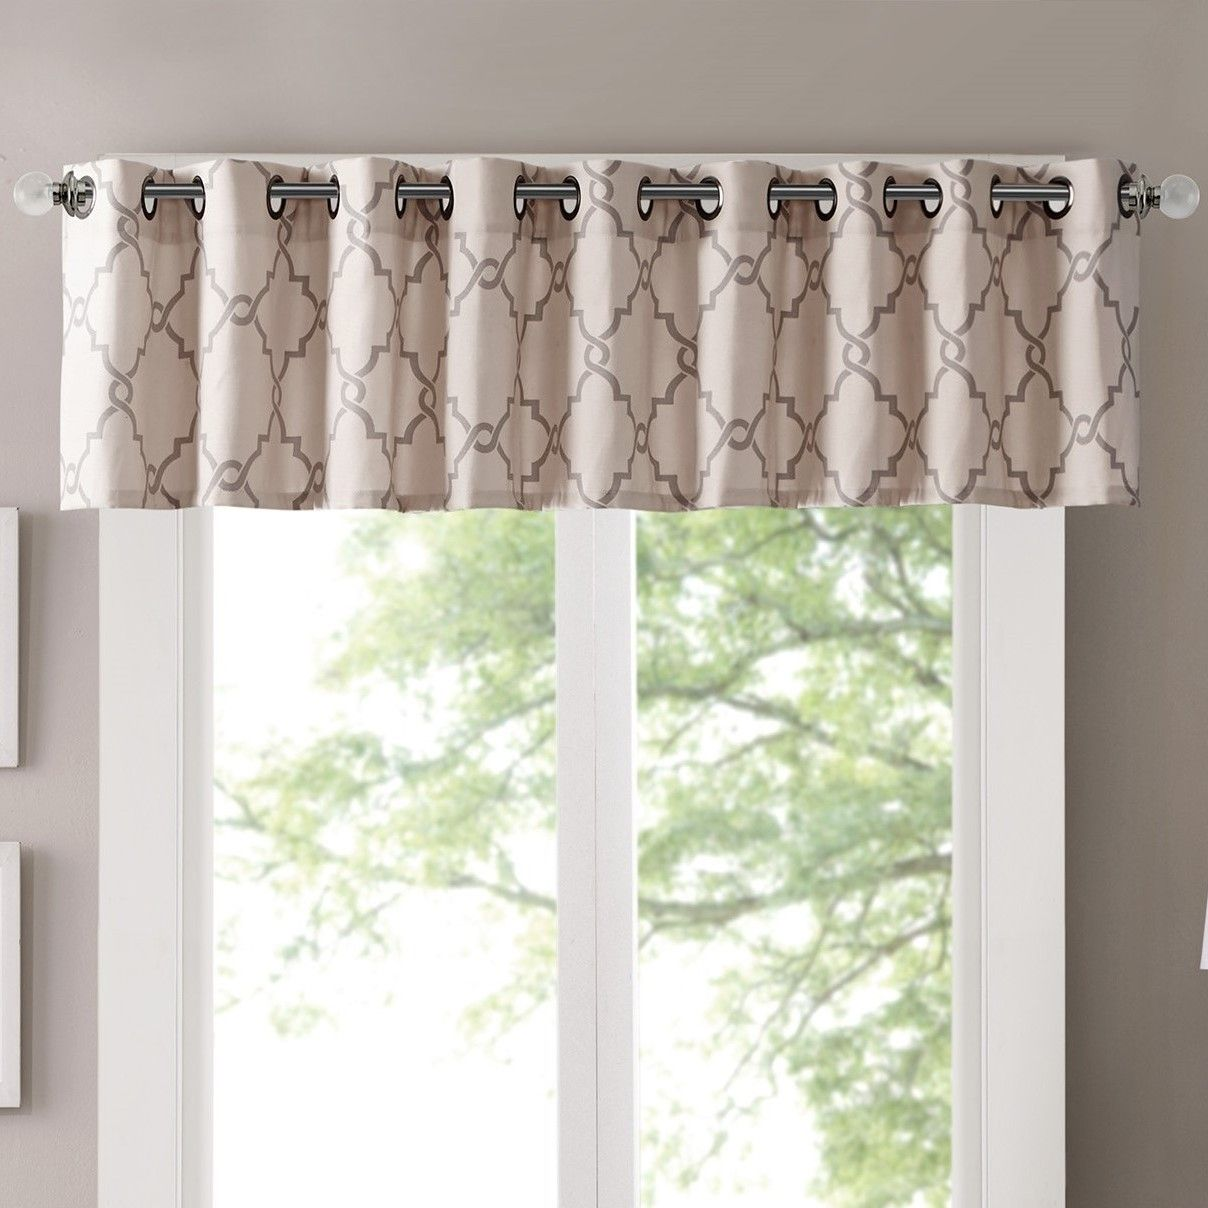 Winnie Trellis Grommet Curtain Valance | Grommet curtains, Curtain ... for Grommet Curtains With Valance  173lyp